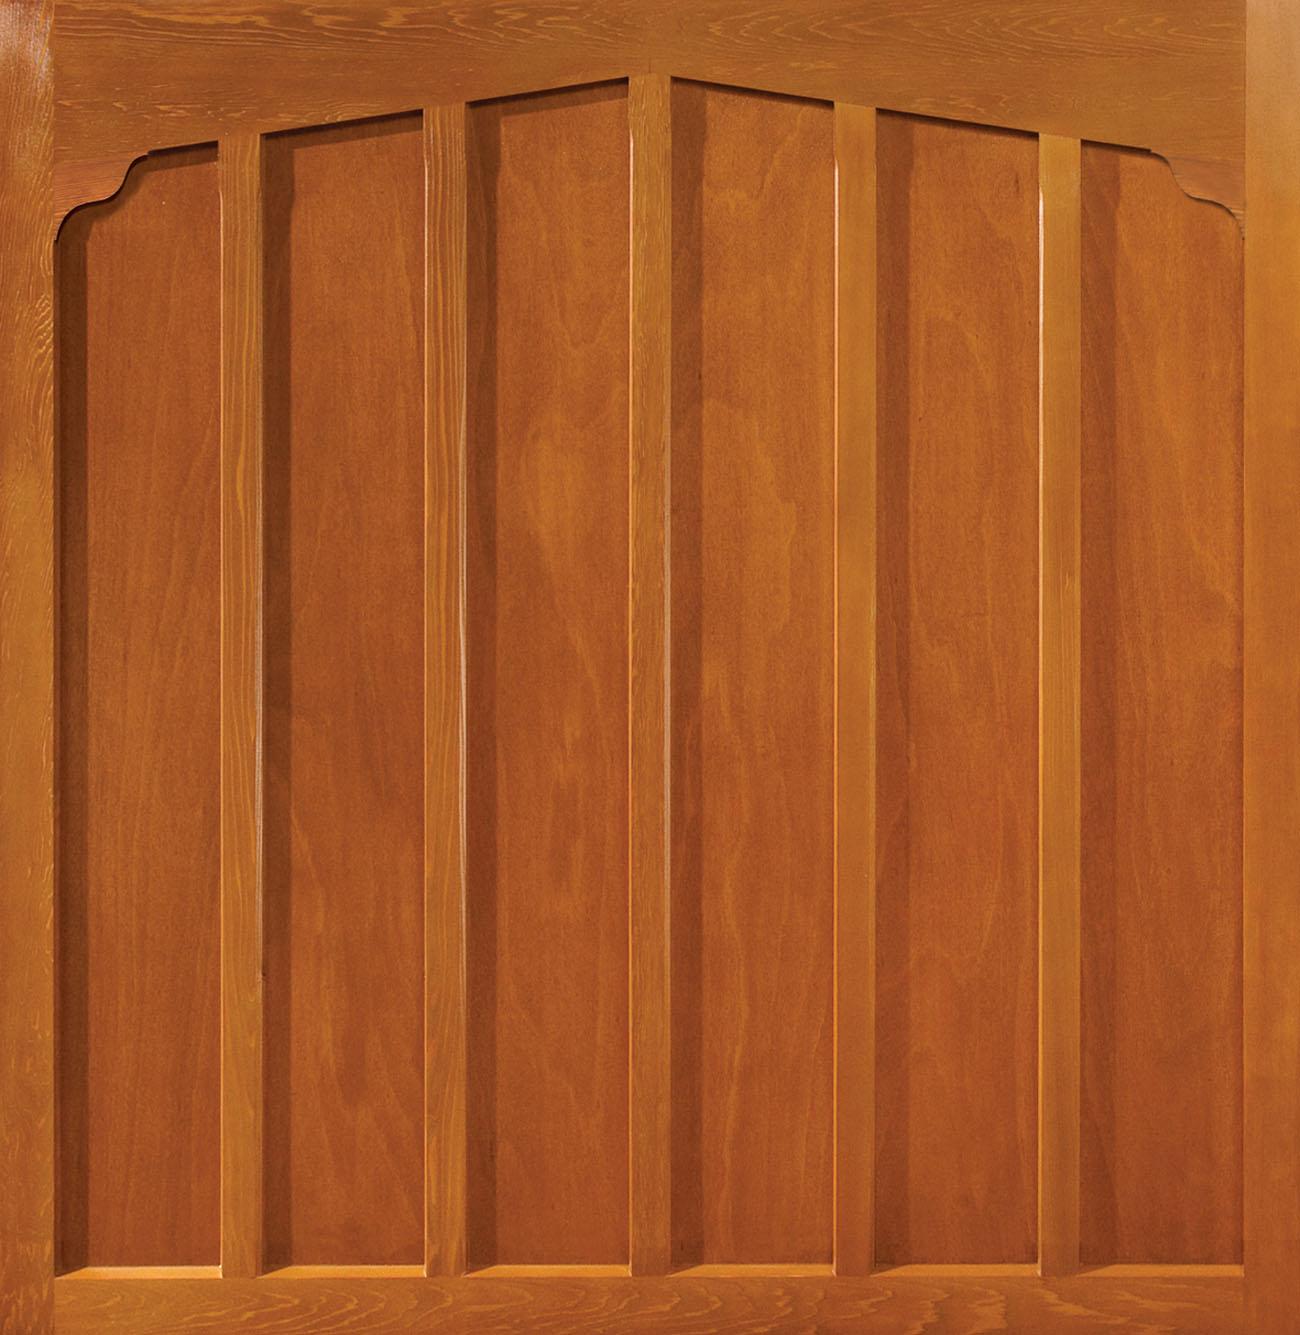 Tickenham panel-built cedar